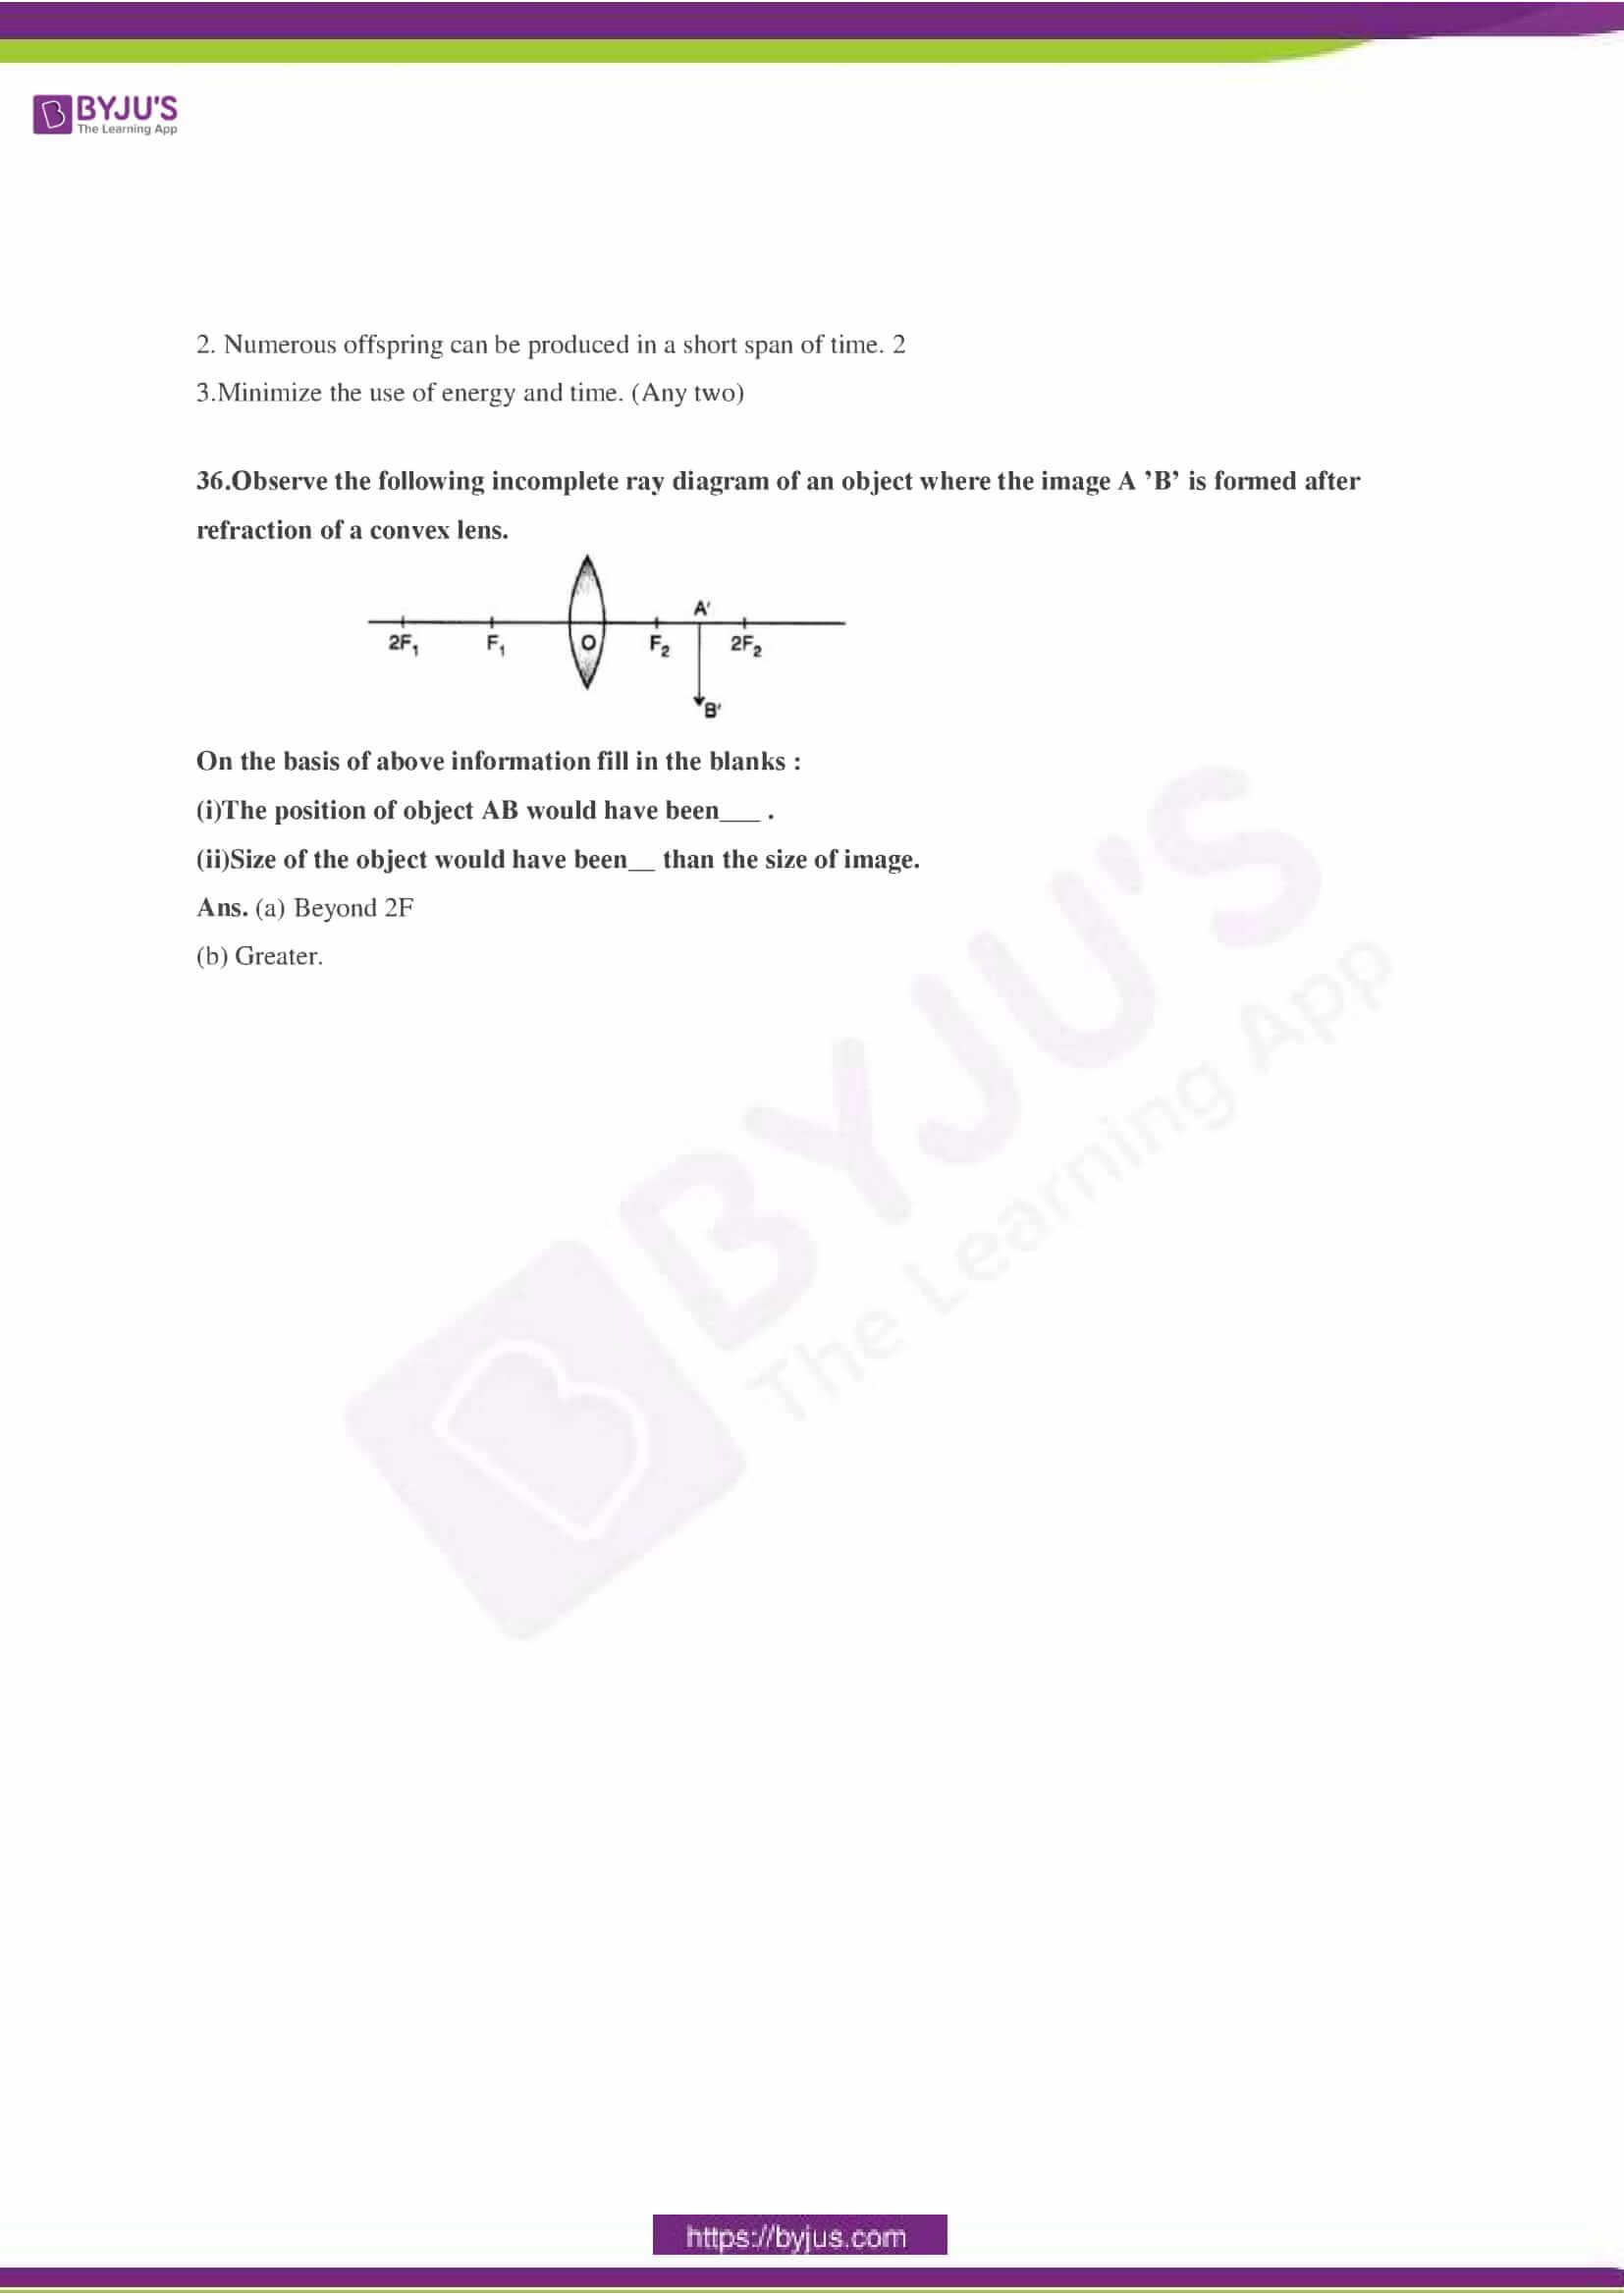 CBSE Class 10 Science Sample Paper Solution Set 3-11